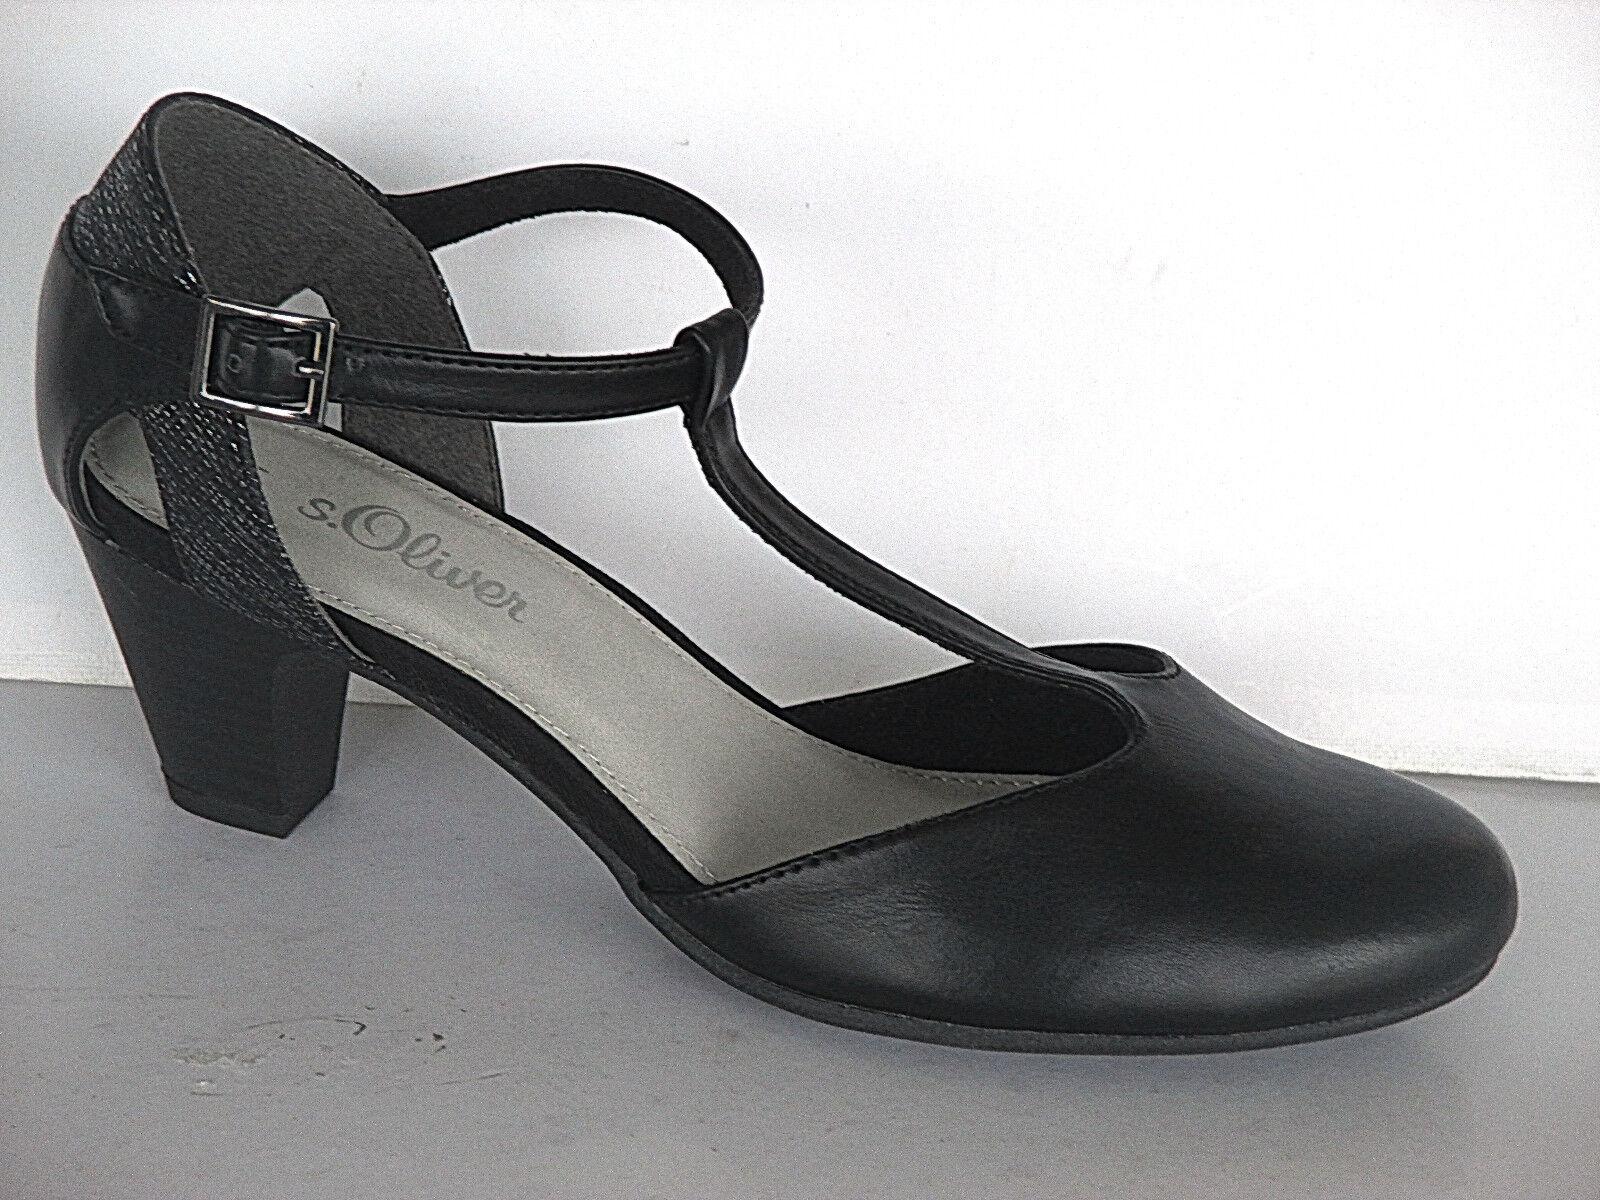 S.Oliver  Schuhe 5/5-24400-20 Damen Schuhe Spangenpumps, Gr. 36-40, Art. 5/5-24400-20 Schuhe  ++NEU+ fa8f72